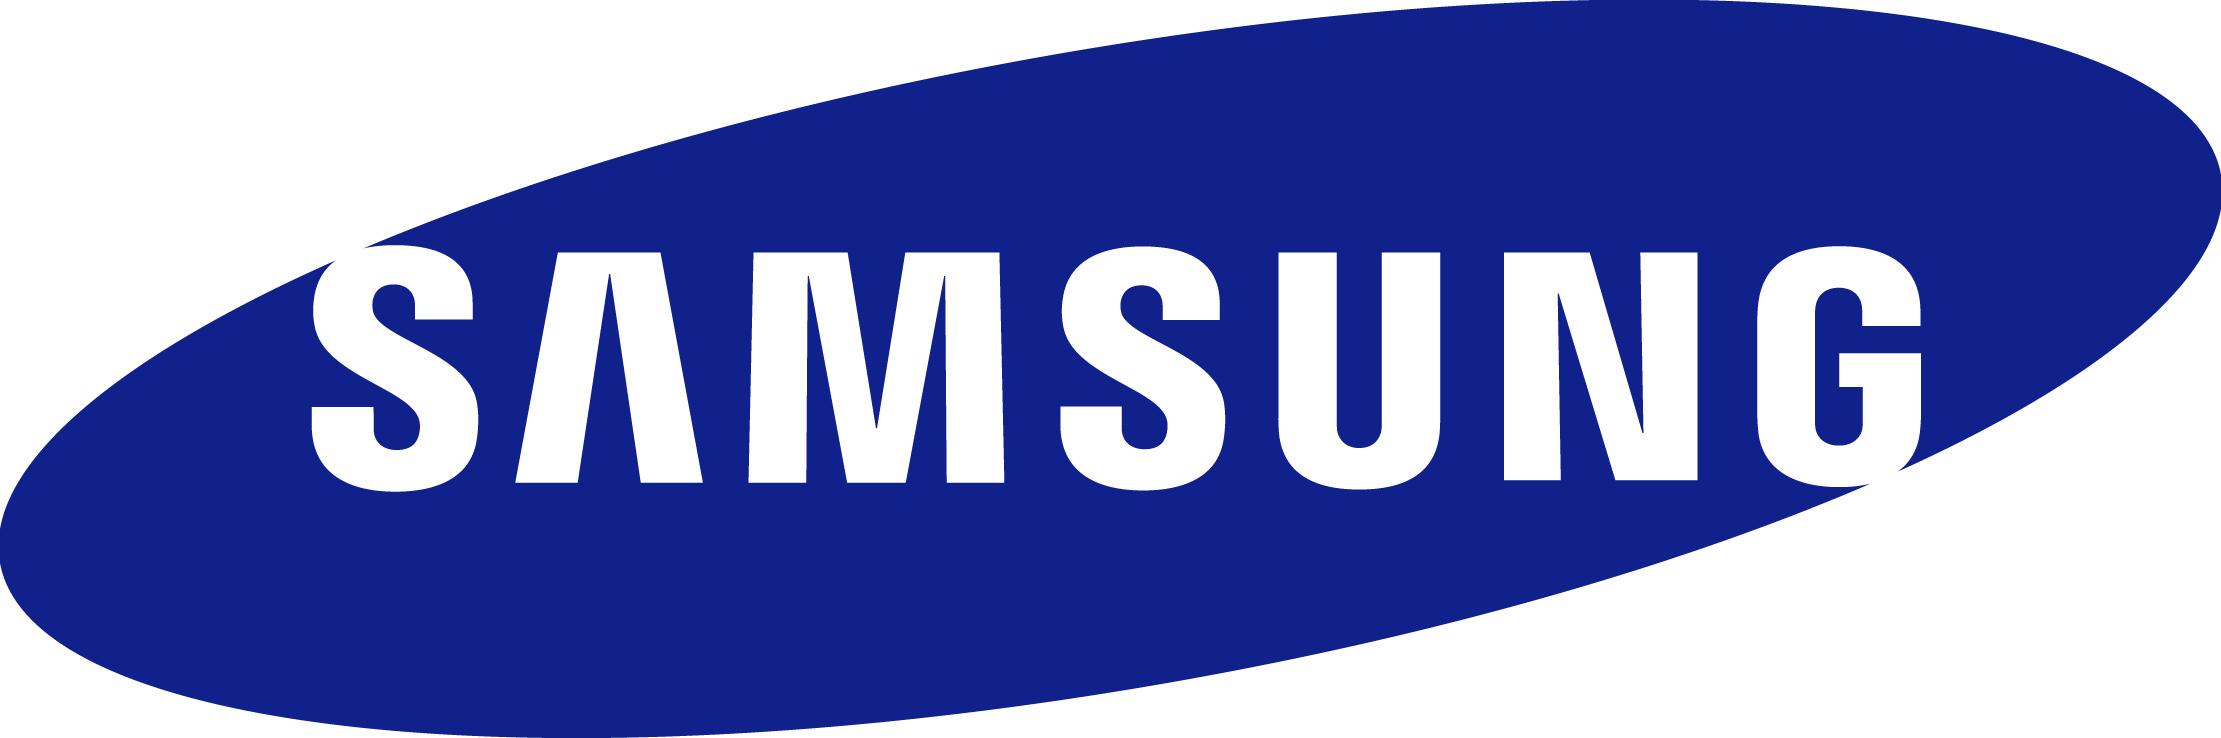 Jeongwoo Kim a fost numit CEO al Samsung Electronics România